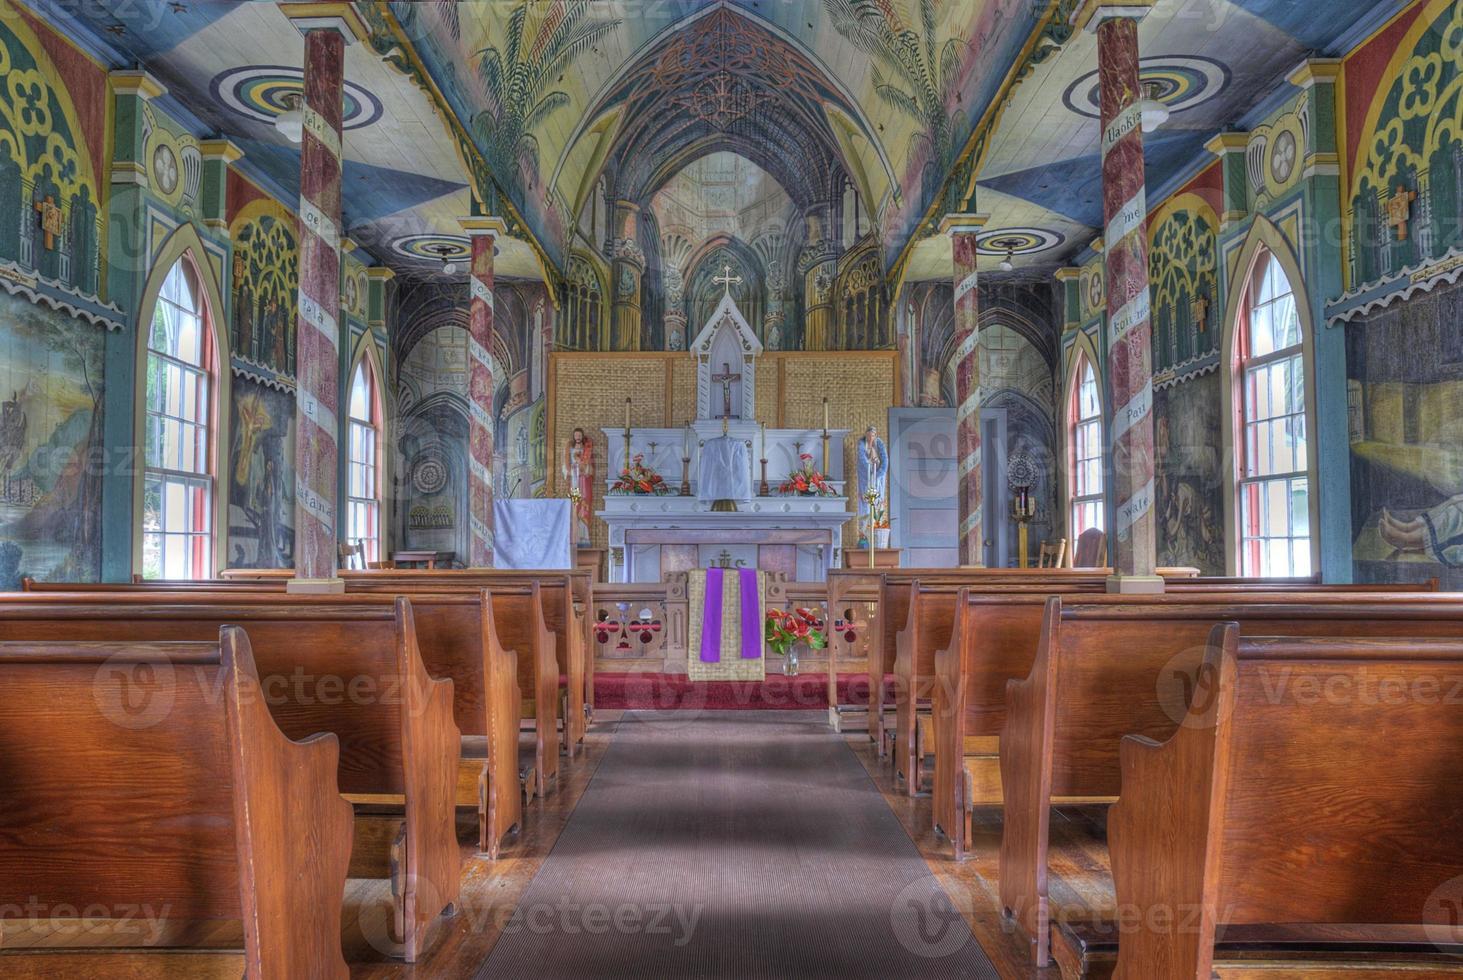 chiesa dipinta foto